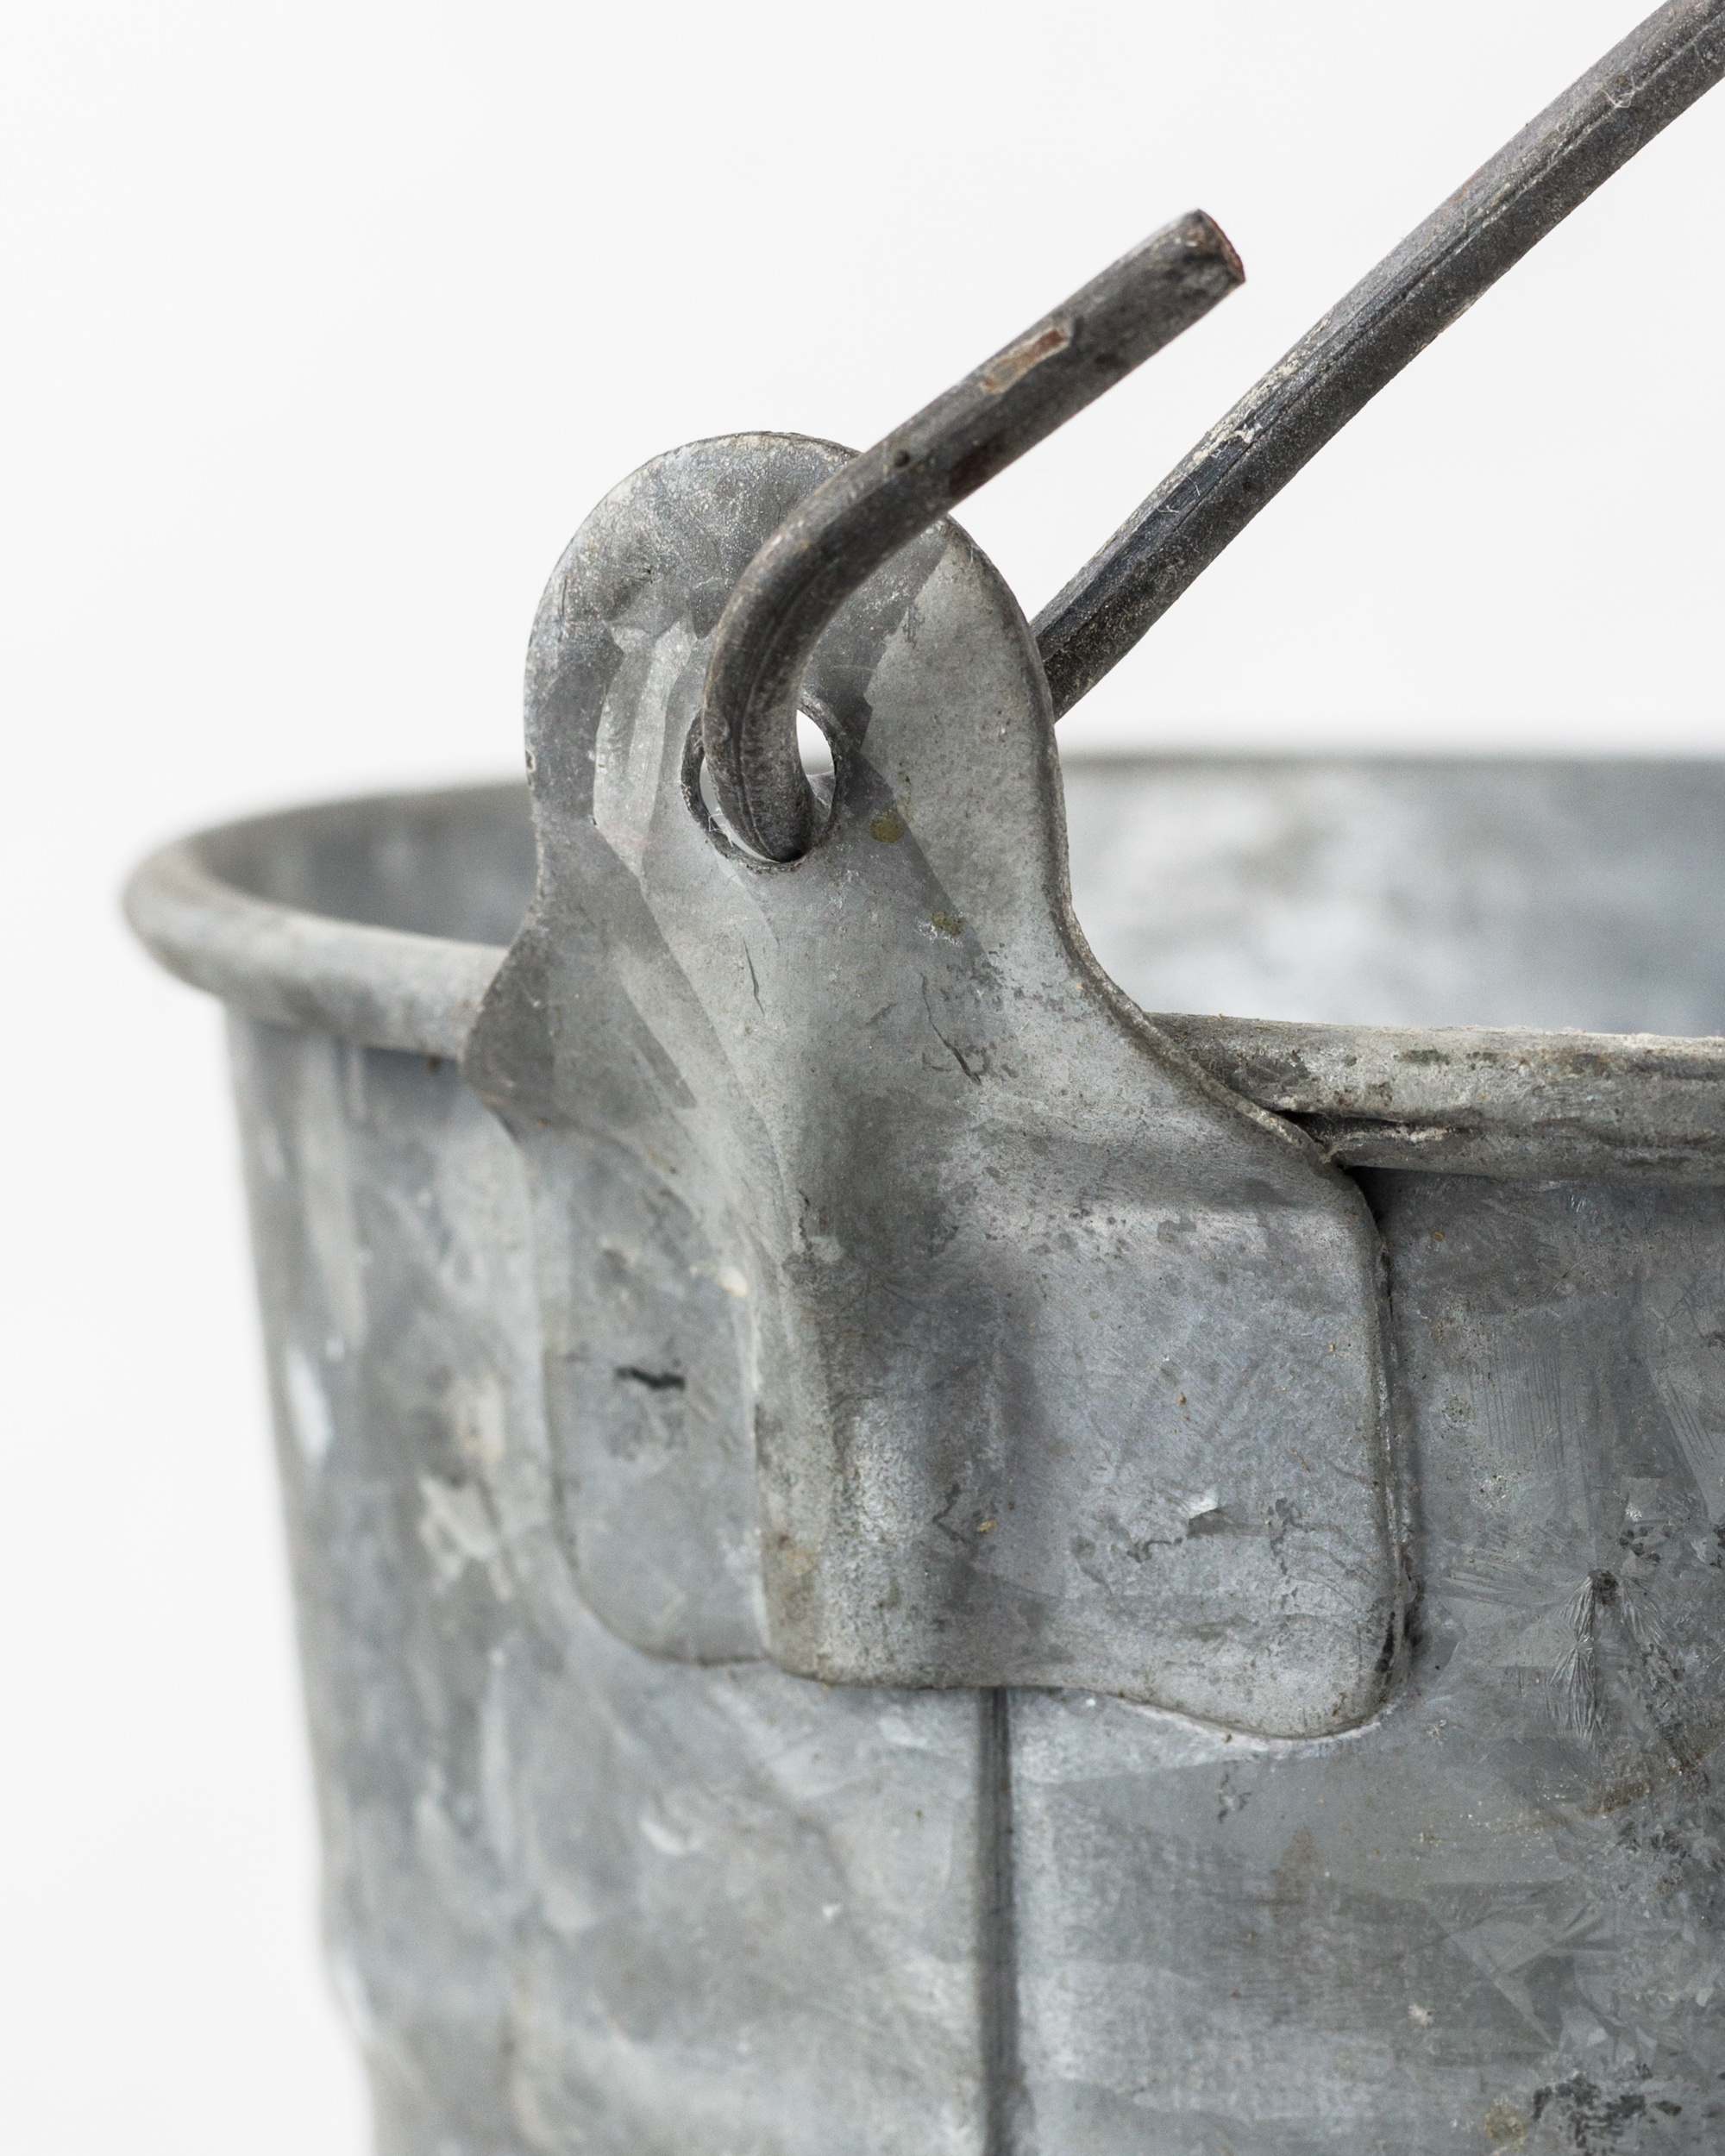 Bucket Handle Left  8x10-1.JPG